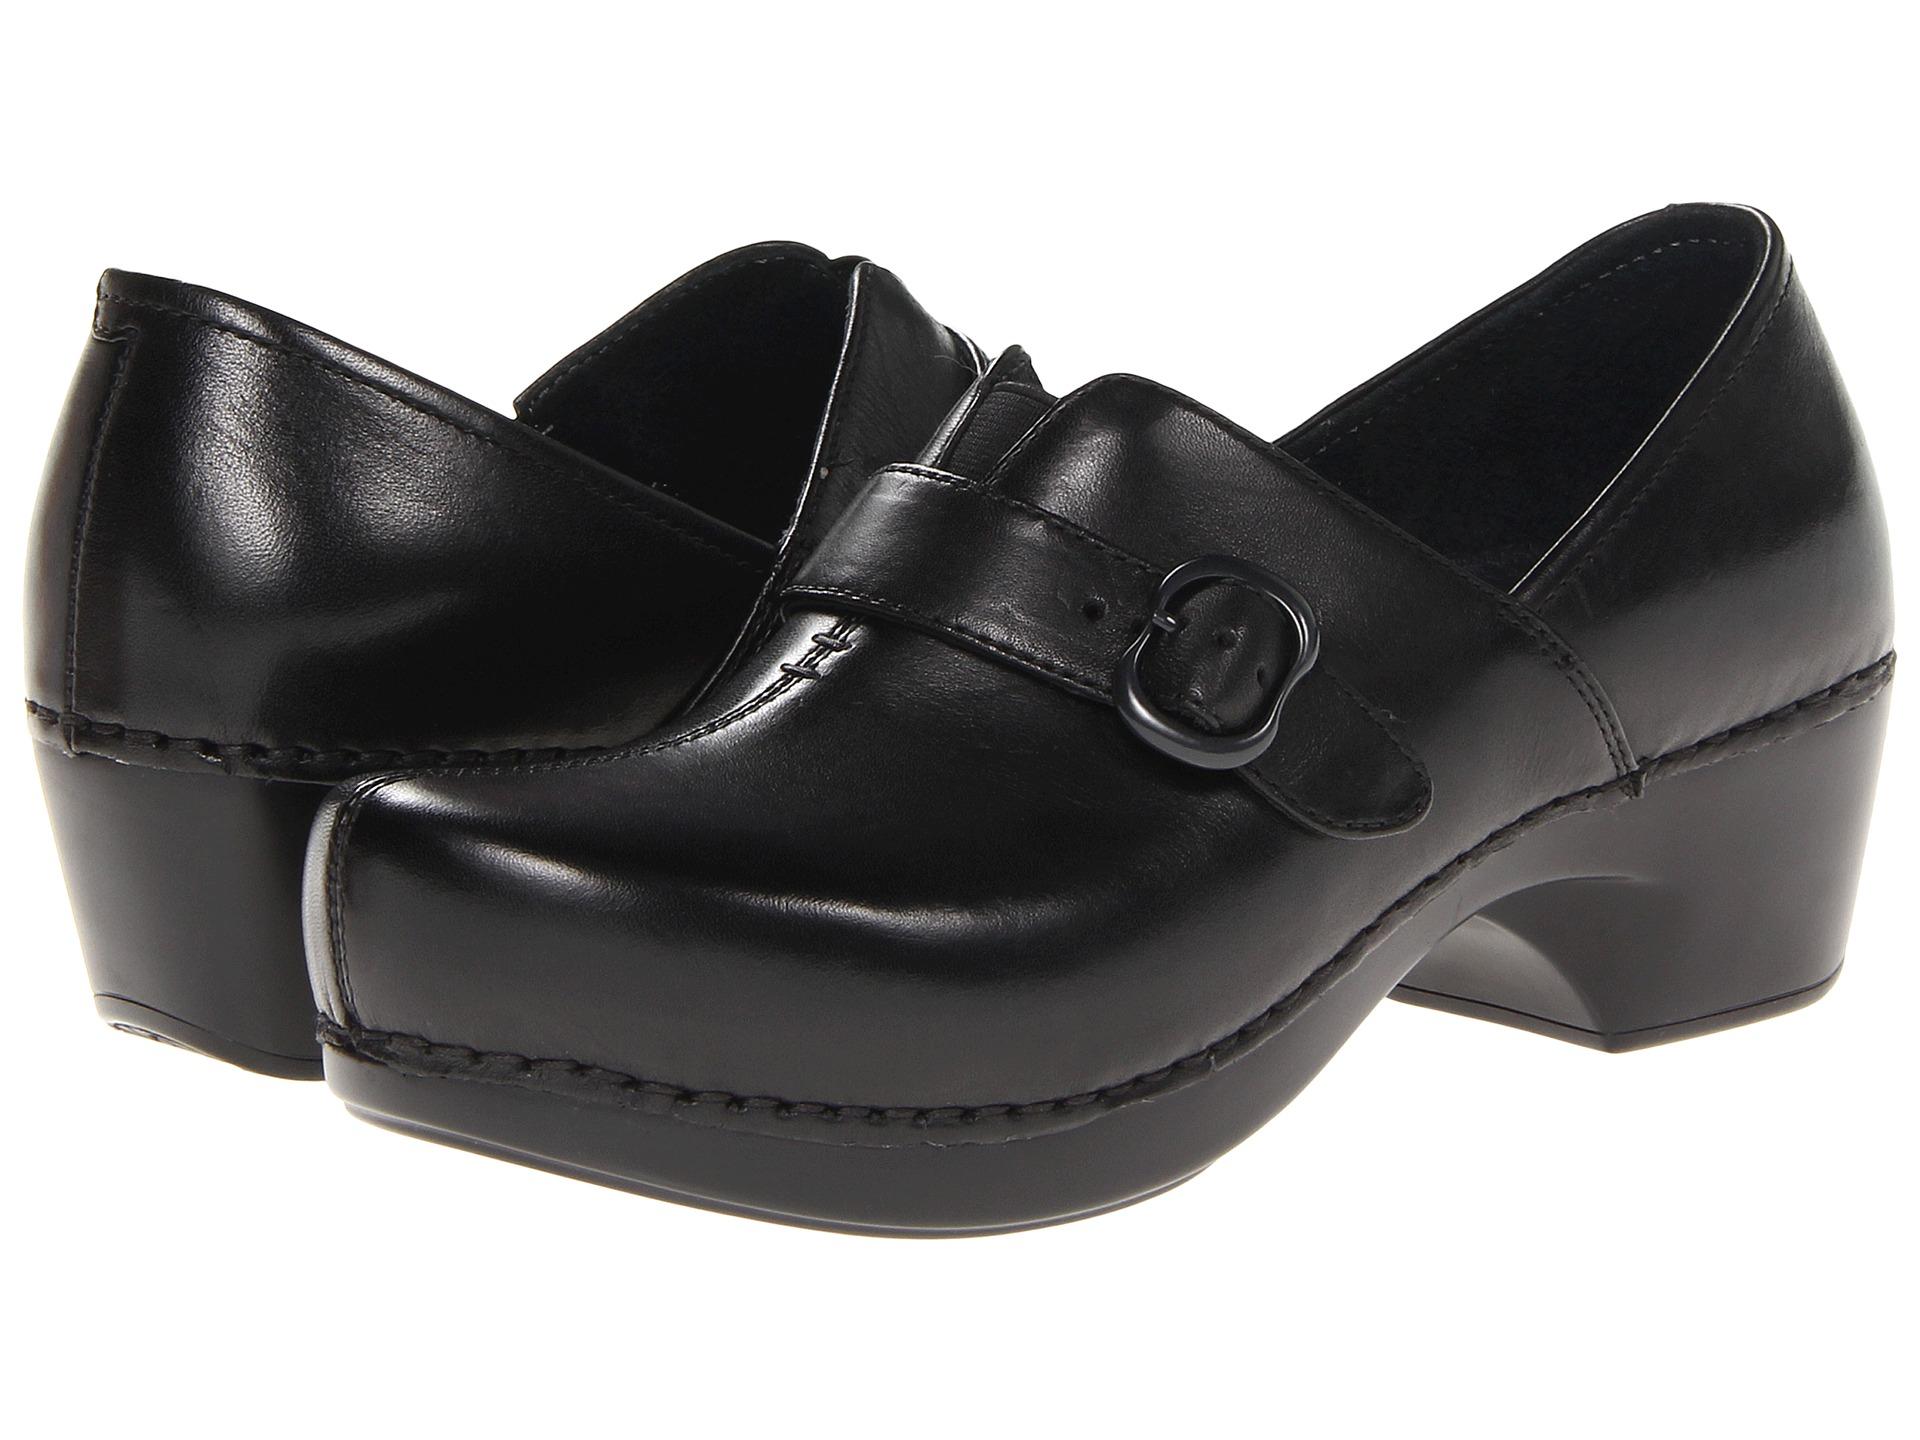 Zappos Womens Shoes Dansko